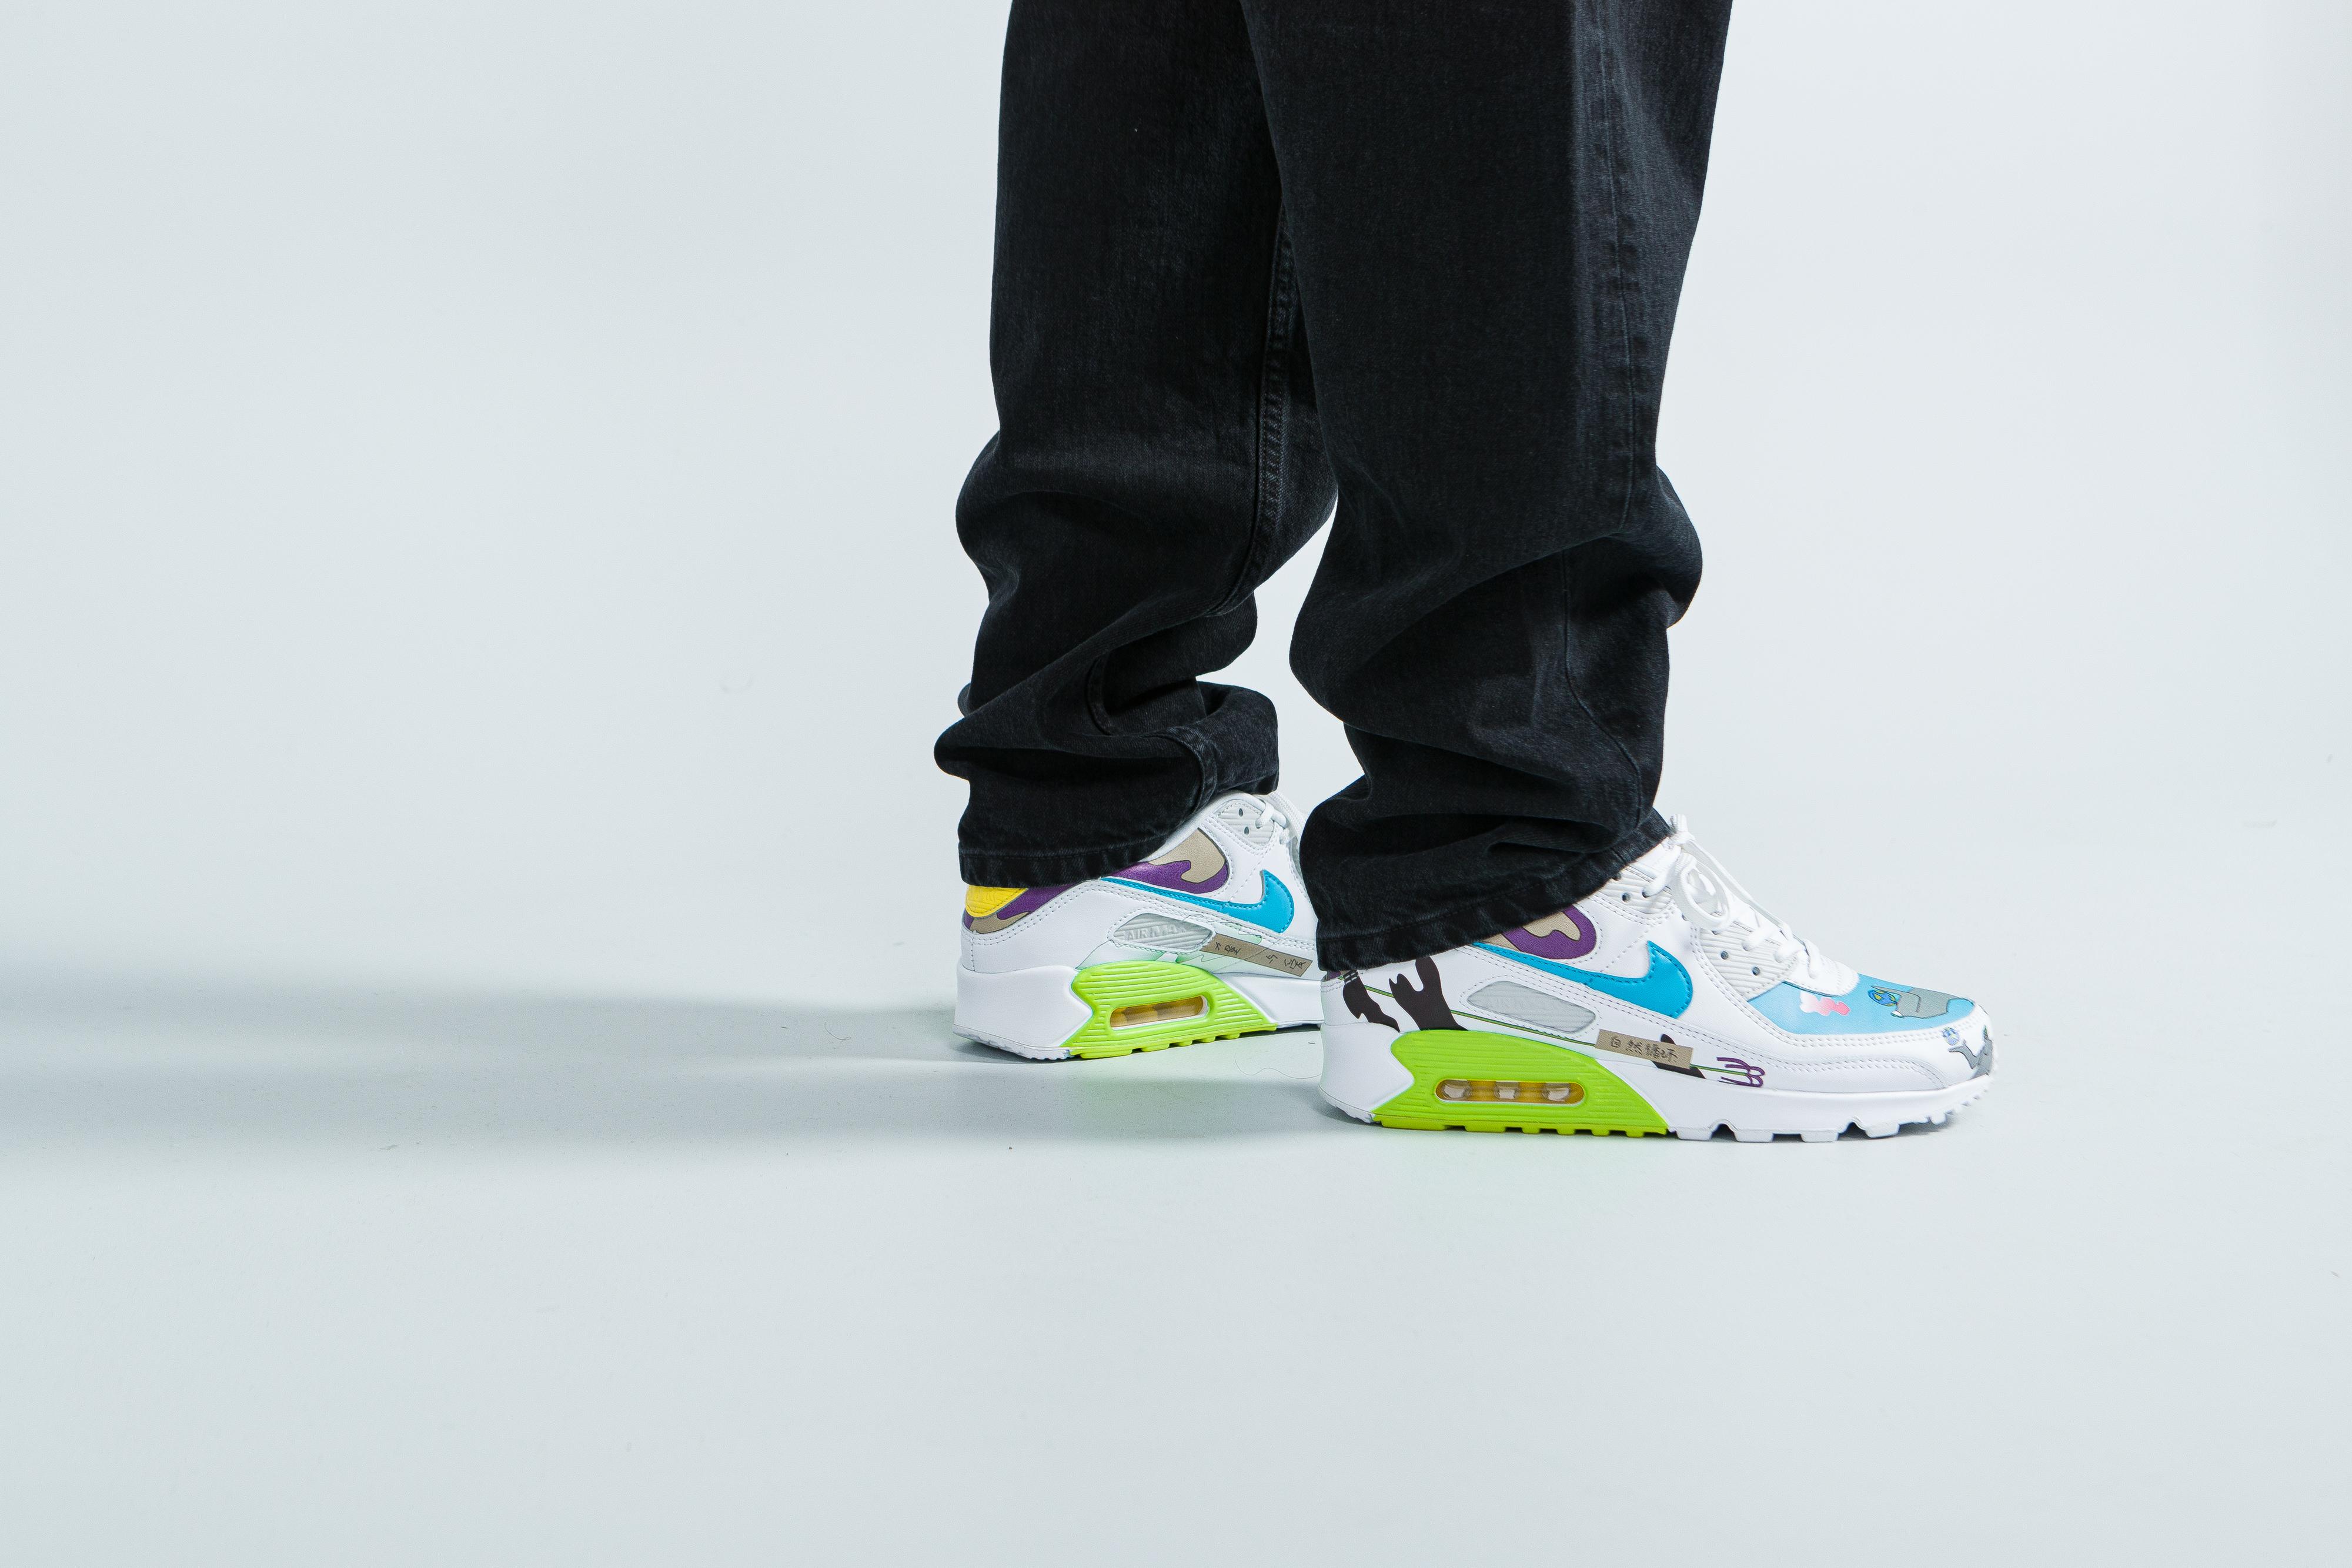 Nike X Ruohan Wang - Flyleather Air Force 1, Air Max 90 & Blazer ...